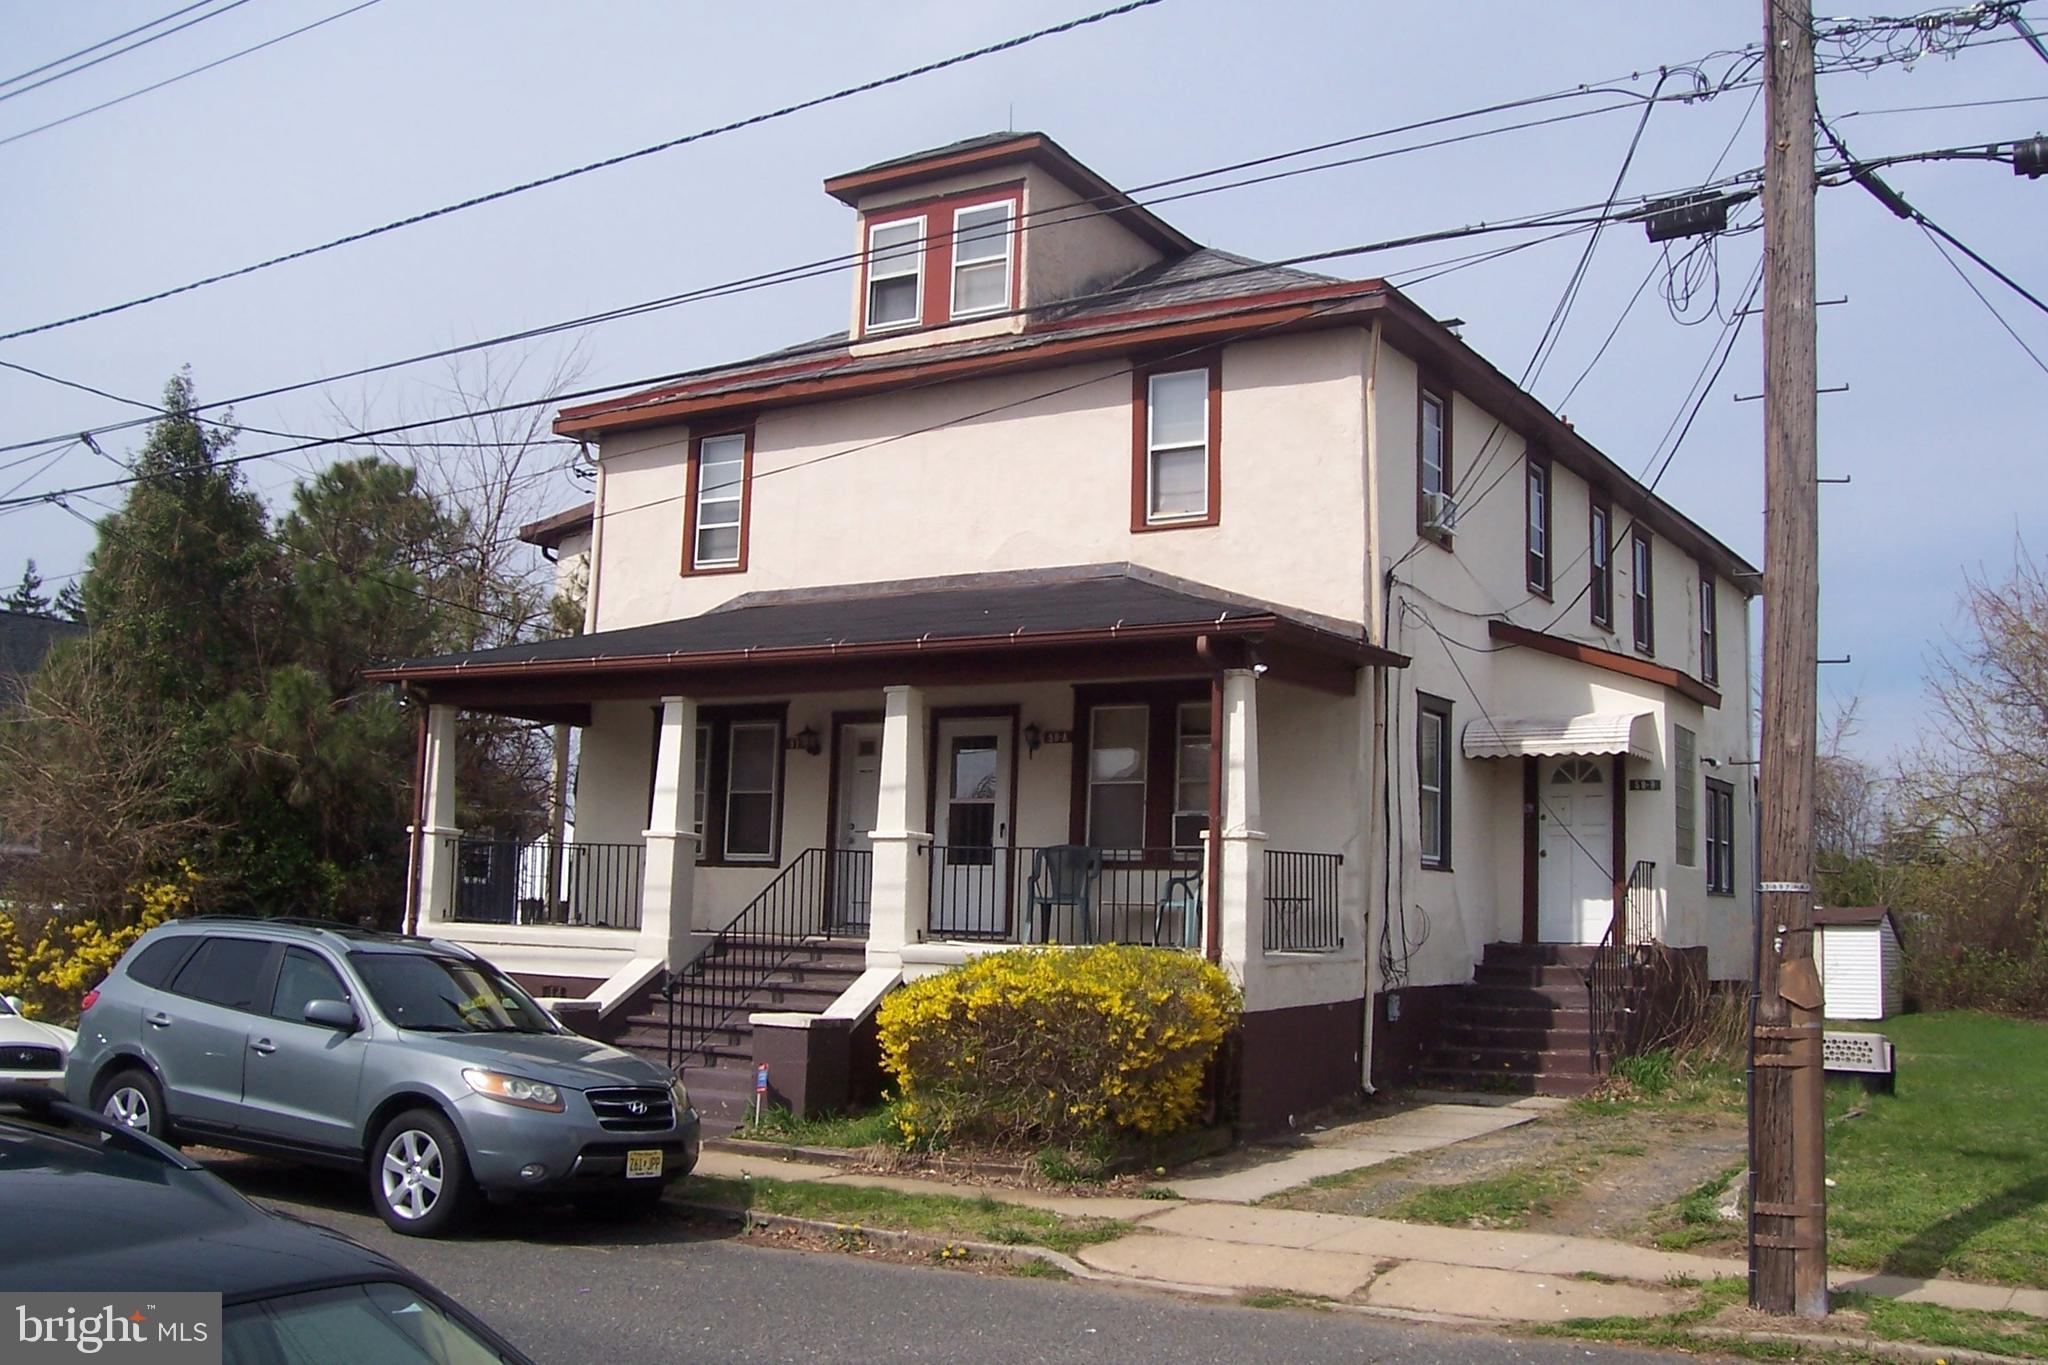 57 PATTERSON, HAMILTON, NJ 08610